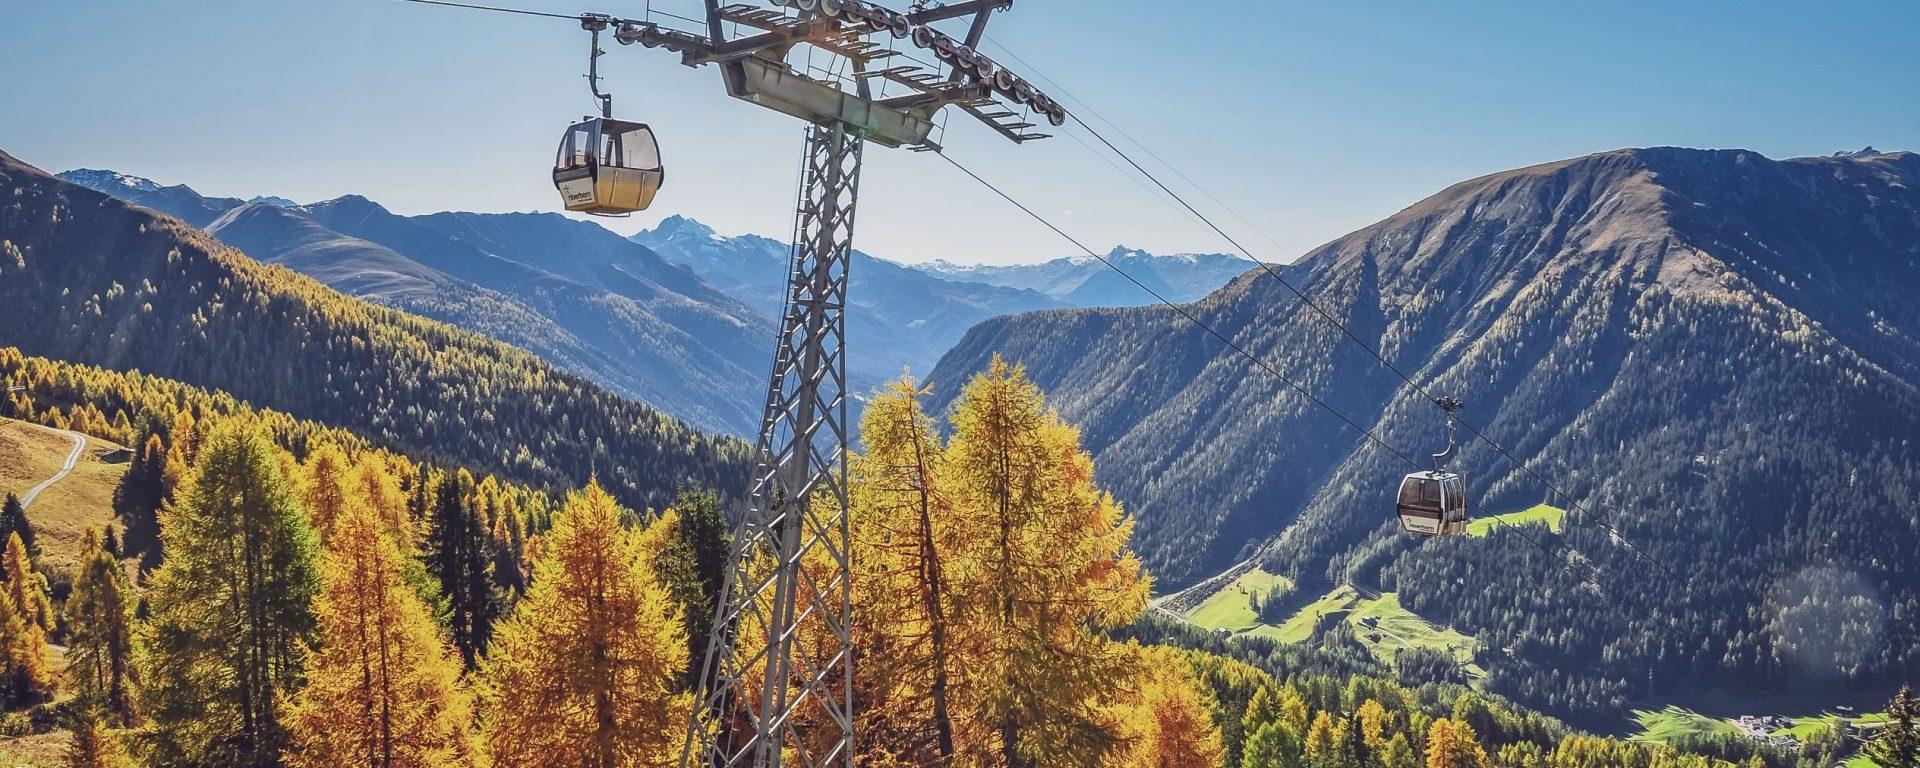 gondelbahn Rinerhorn Davos Glaris